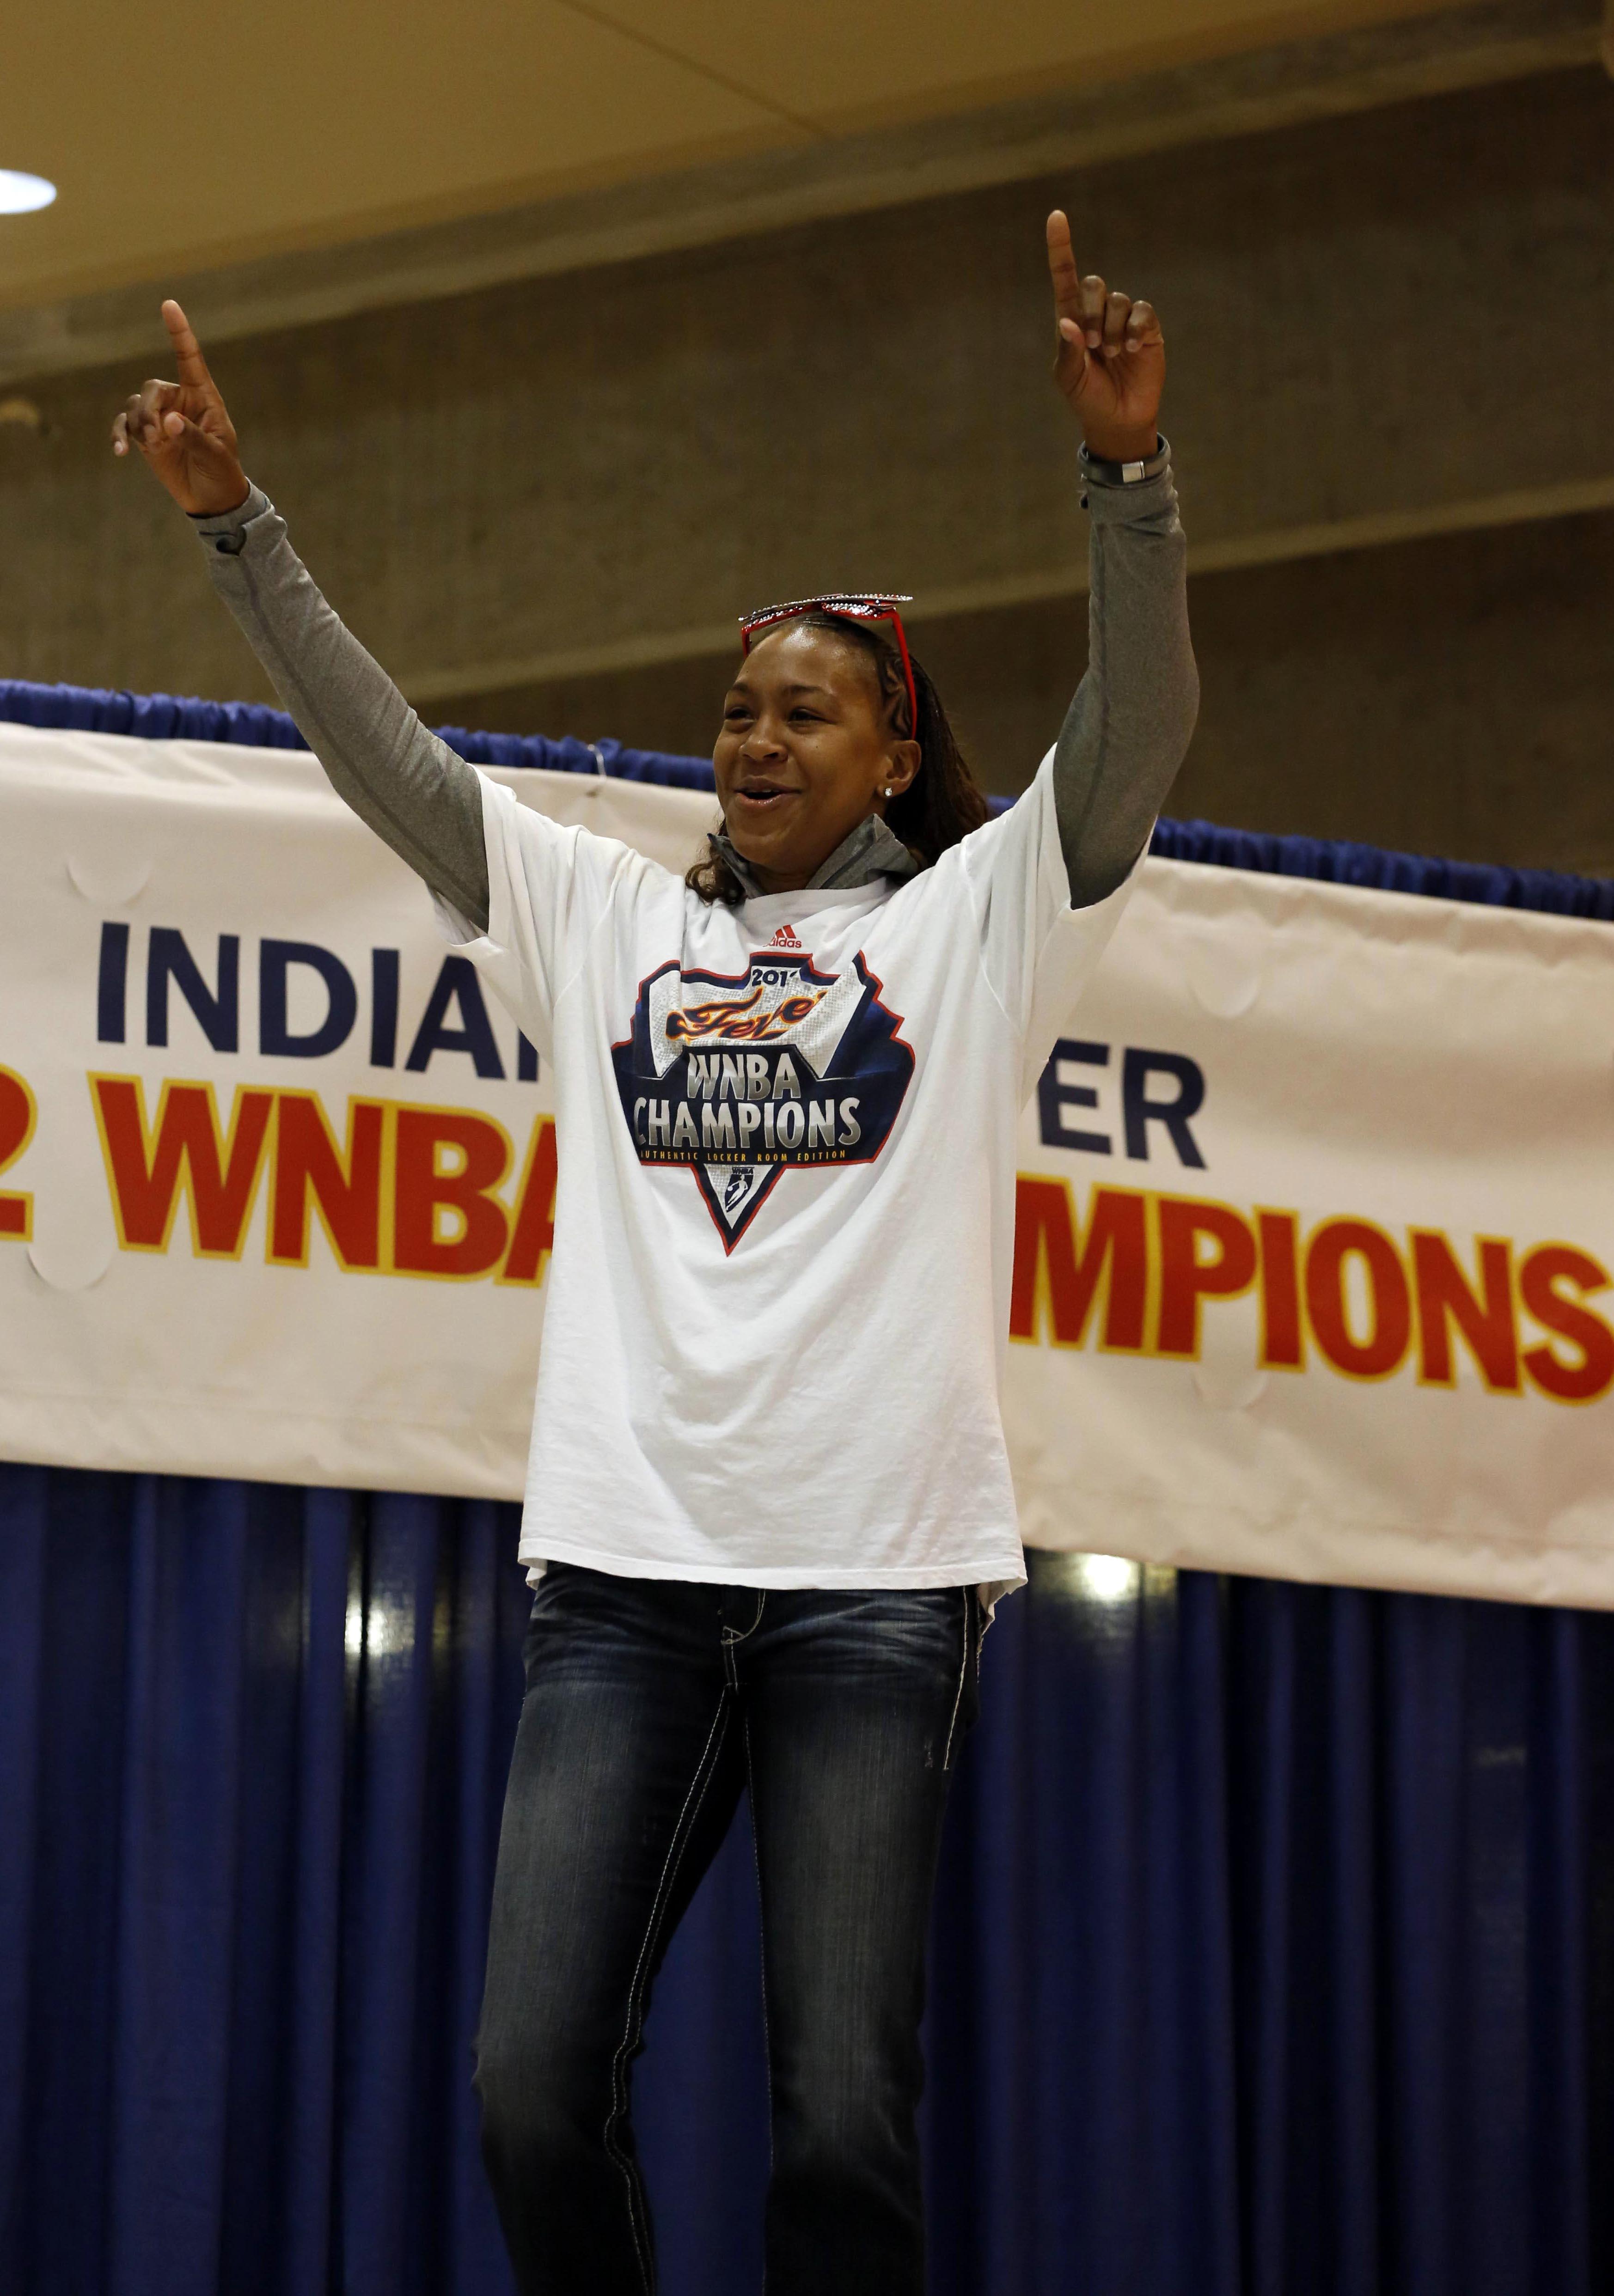 Catchings finally achieved a lifelong dream: winning a WNBA Championship in 2012.